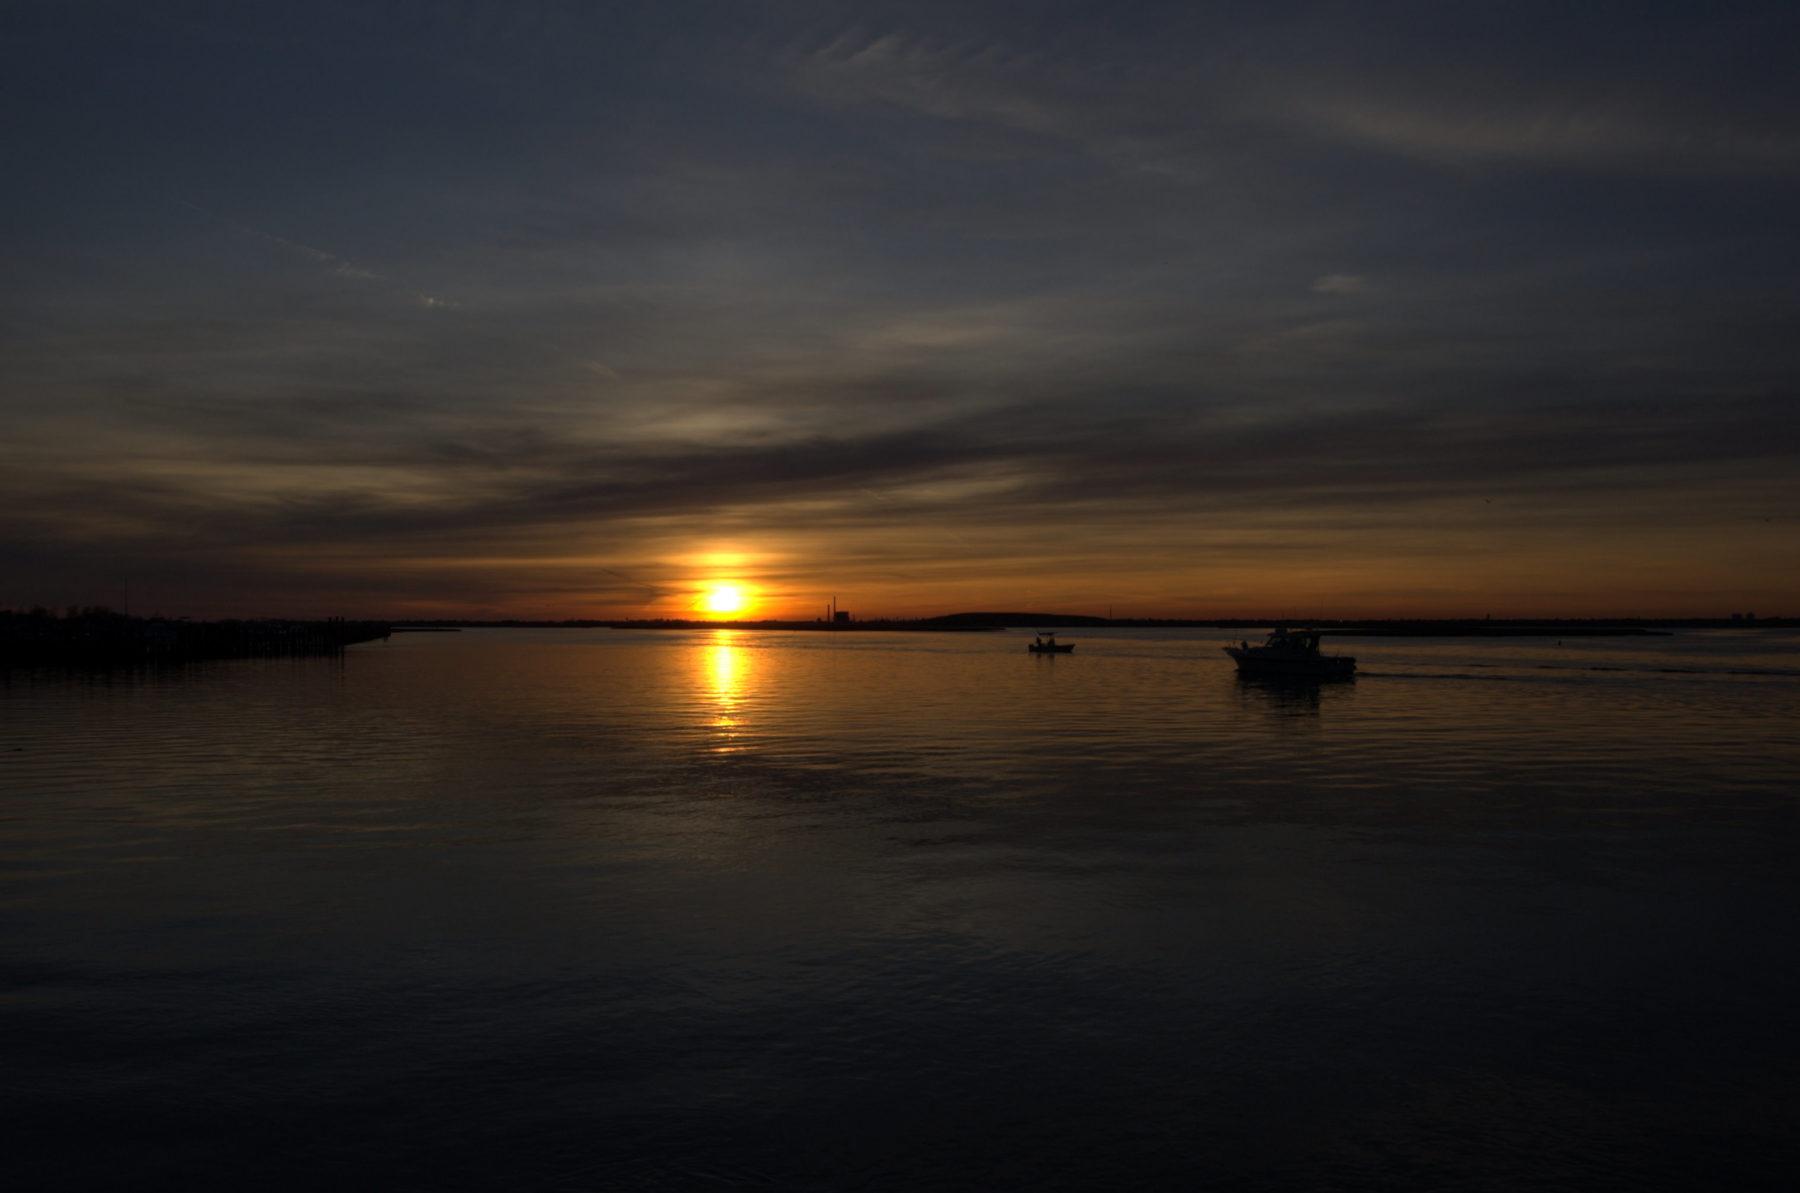 Sunset at a beach on Long Island